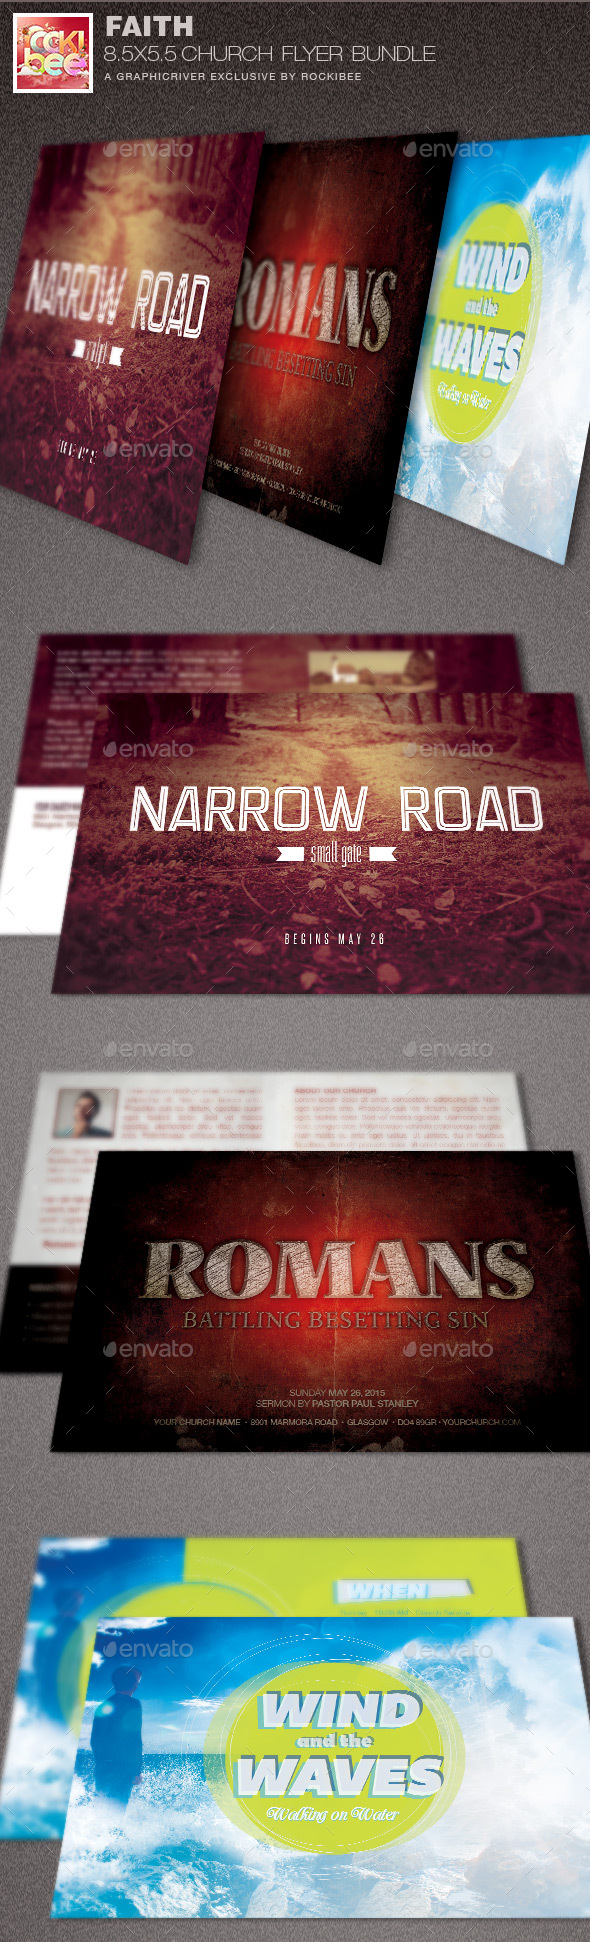 Faith Church Flyer Template Bundle Image Preview